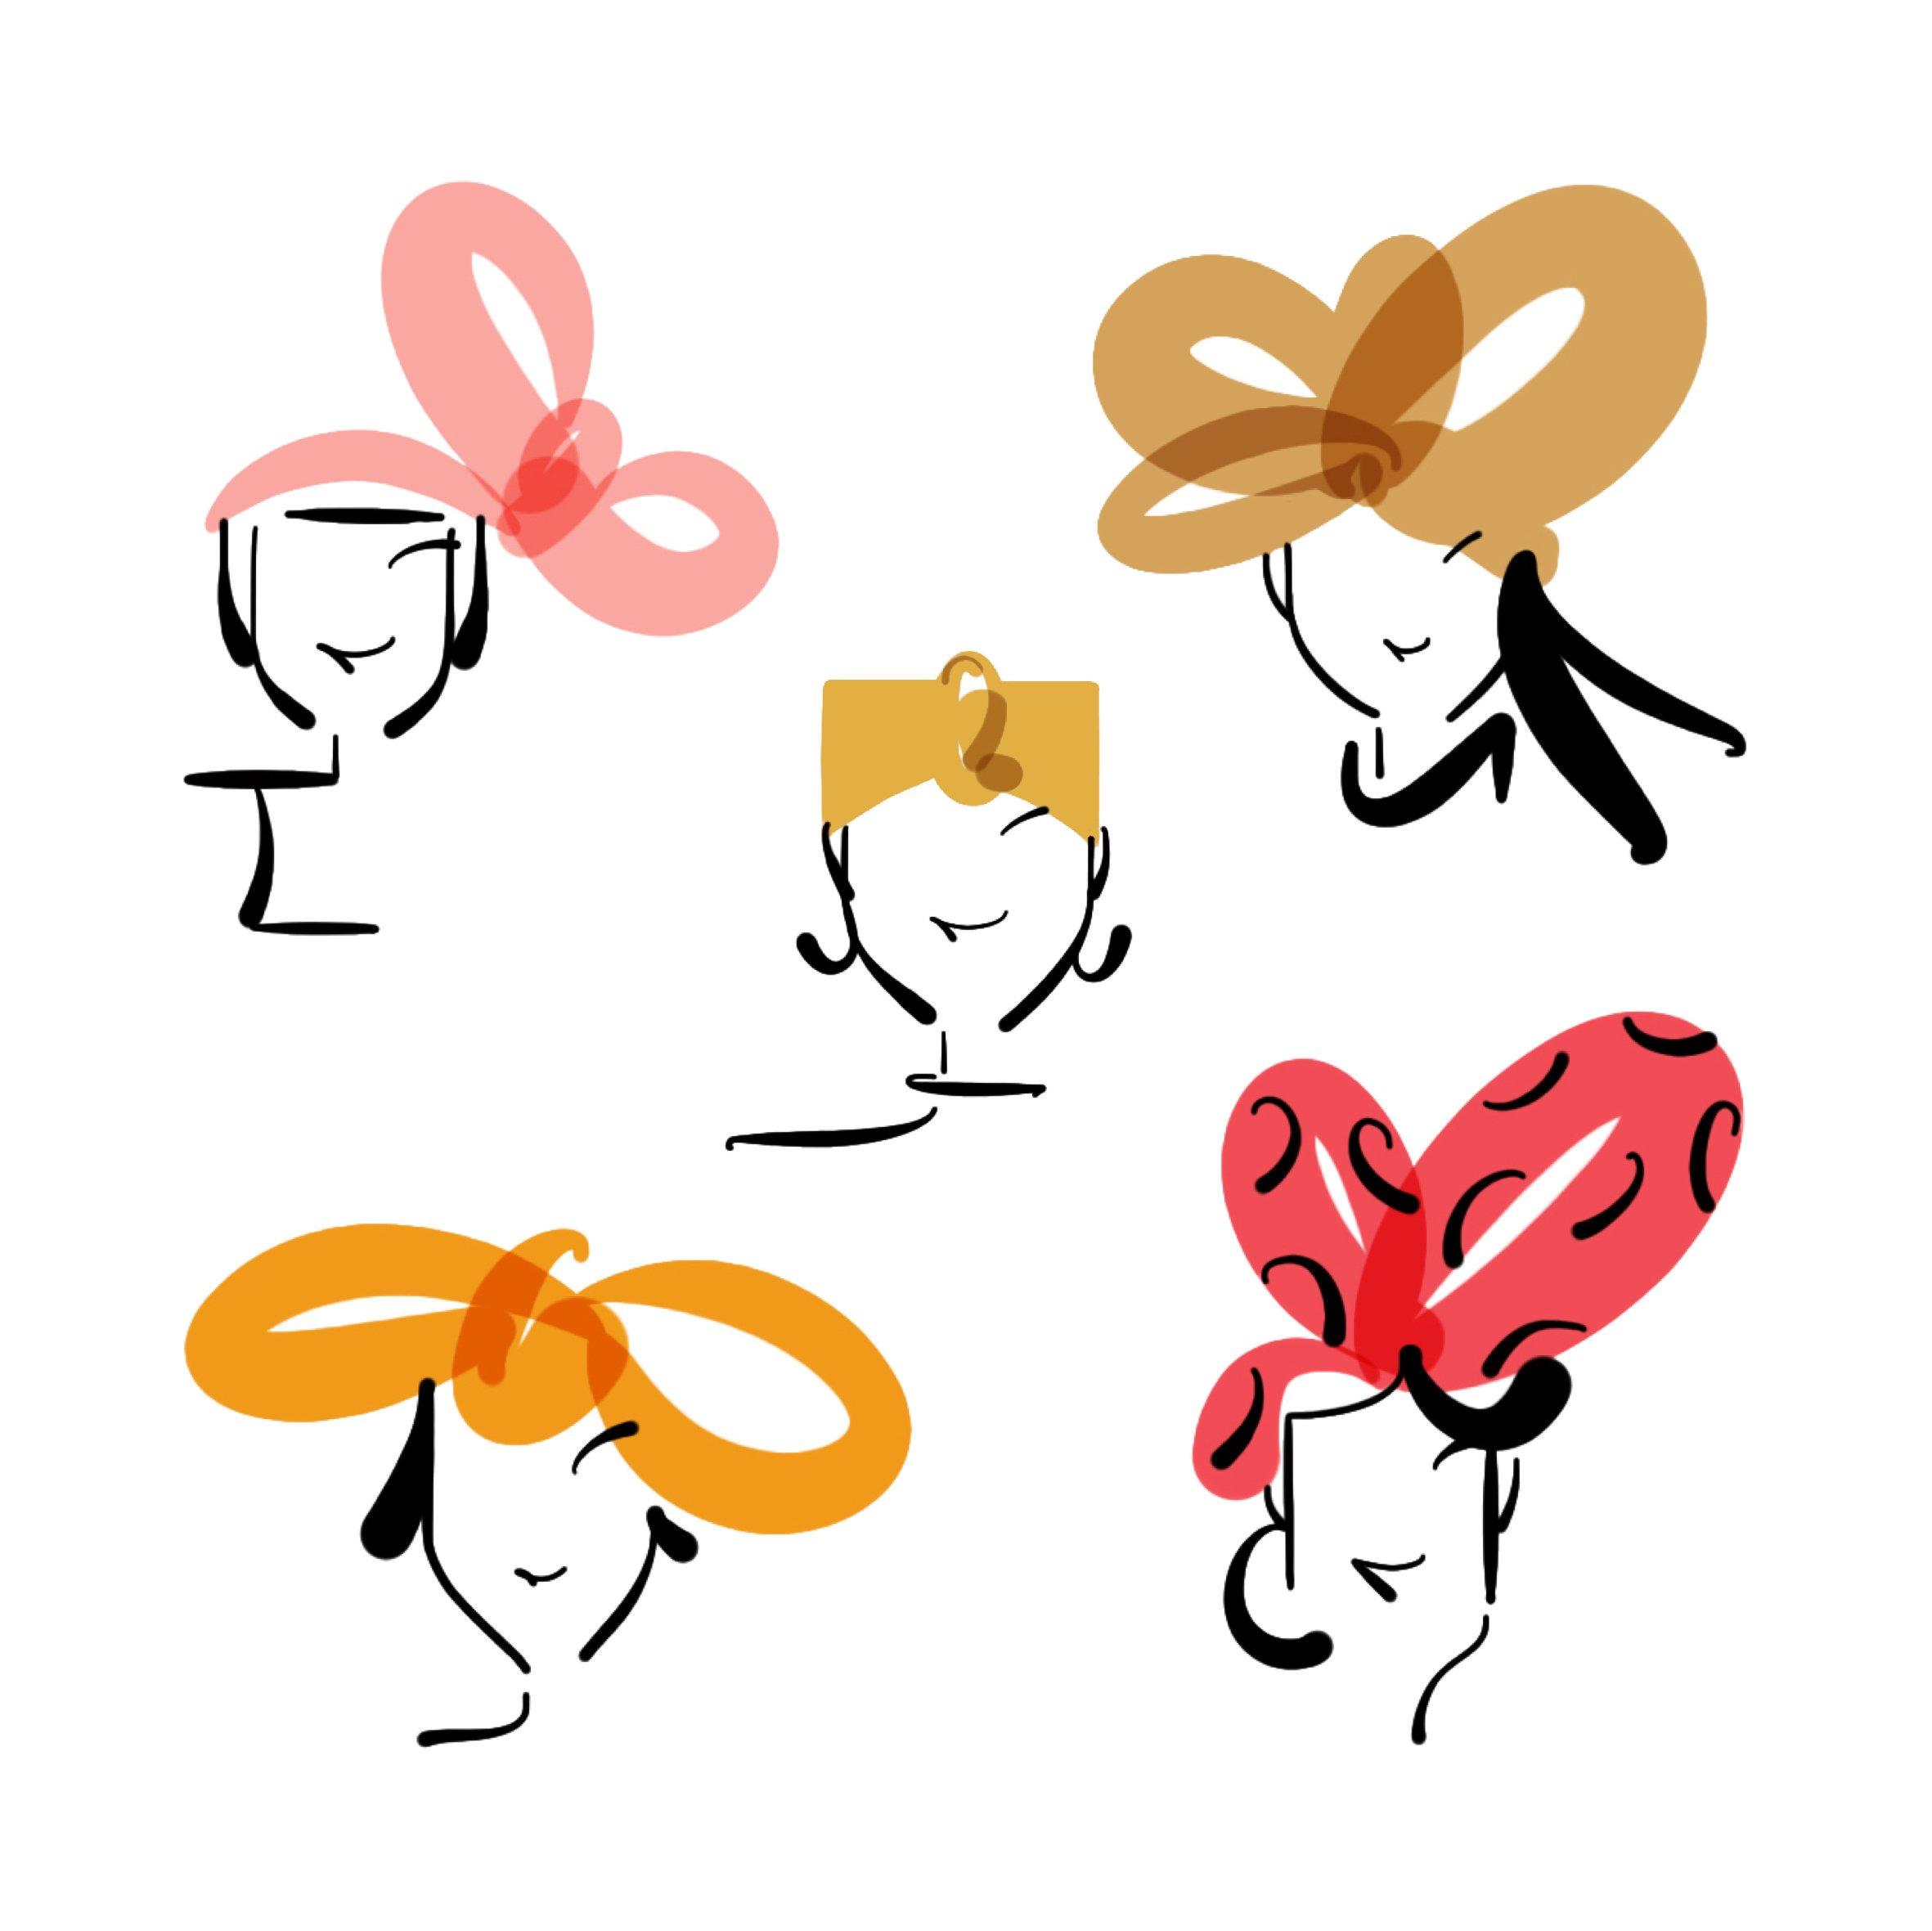 headbands illustration lucy monkman